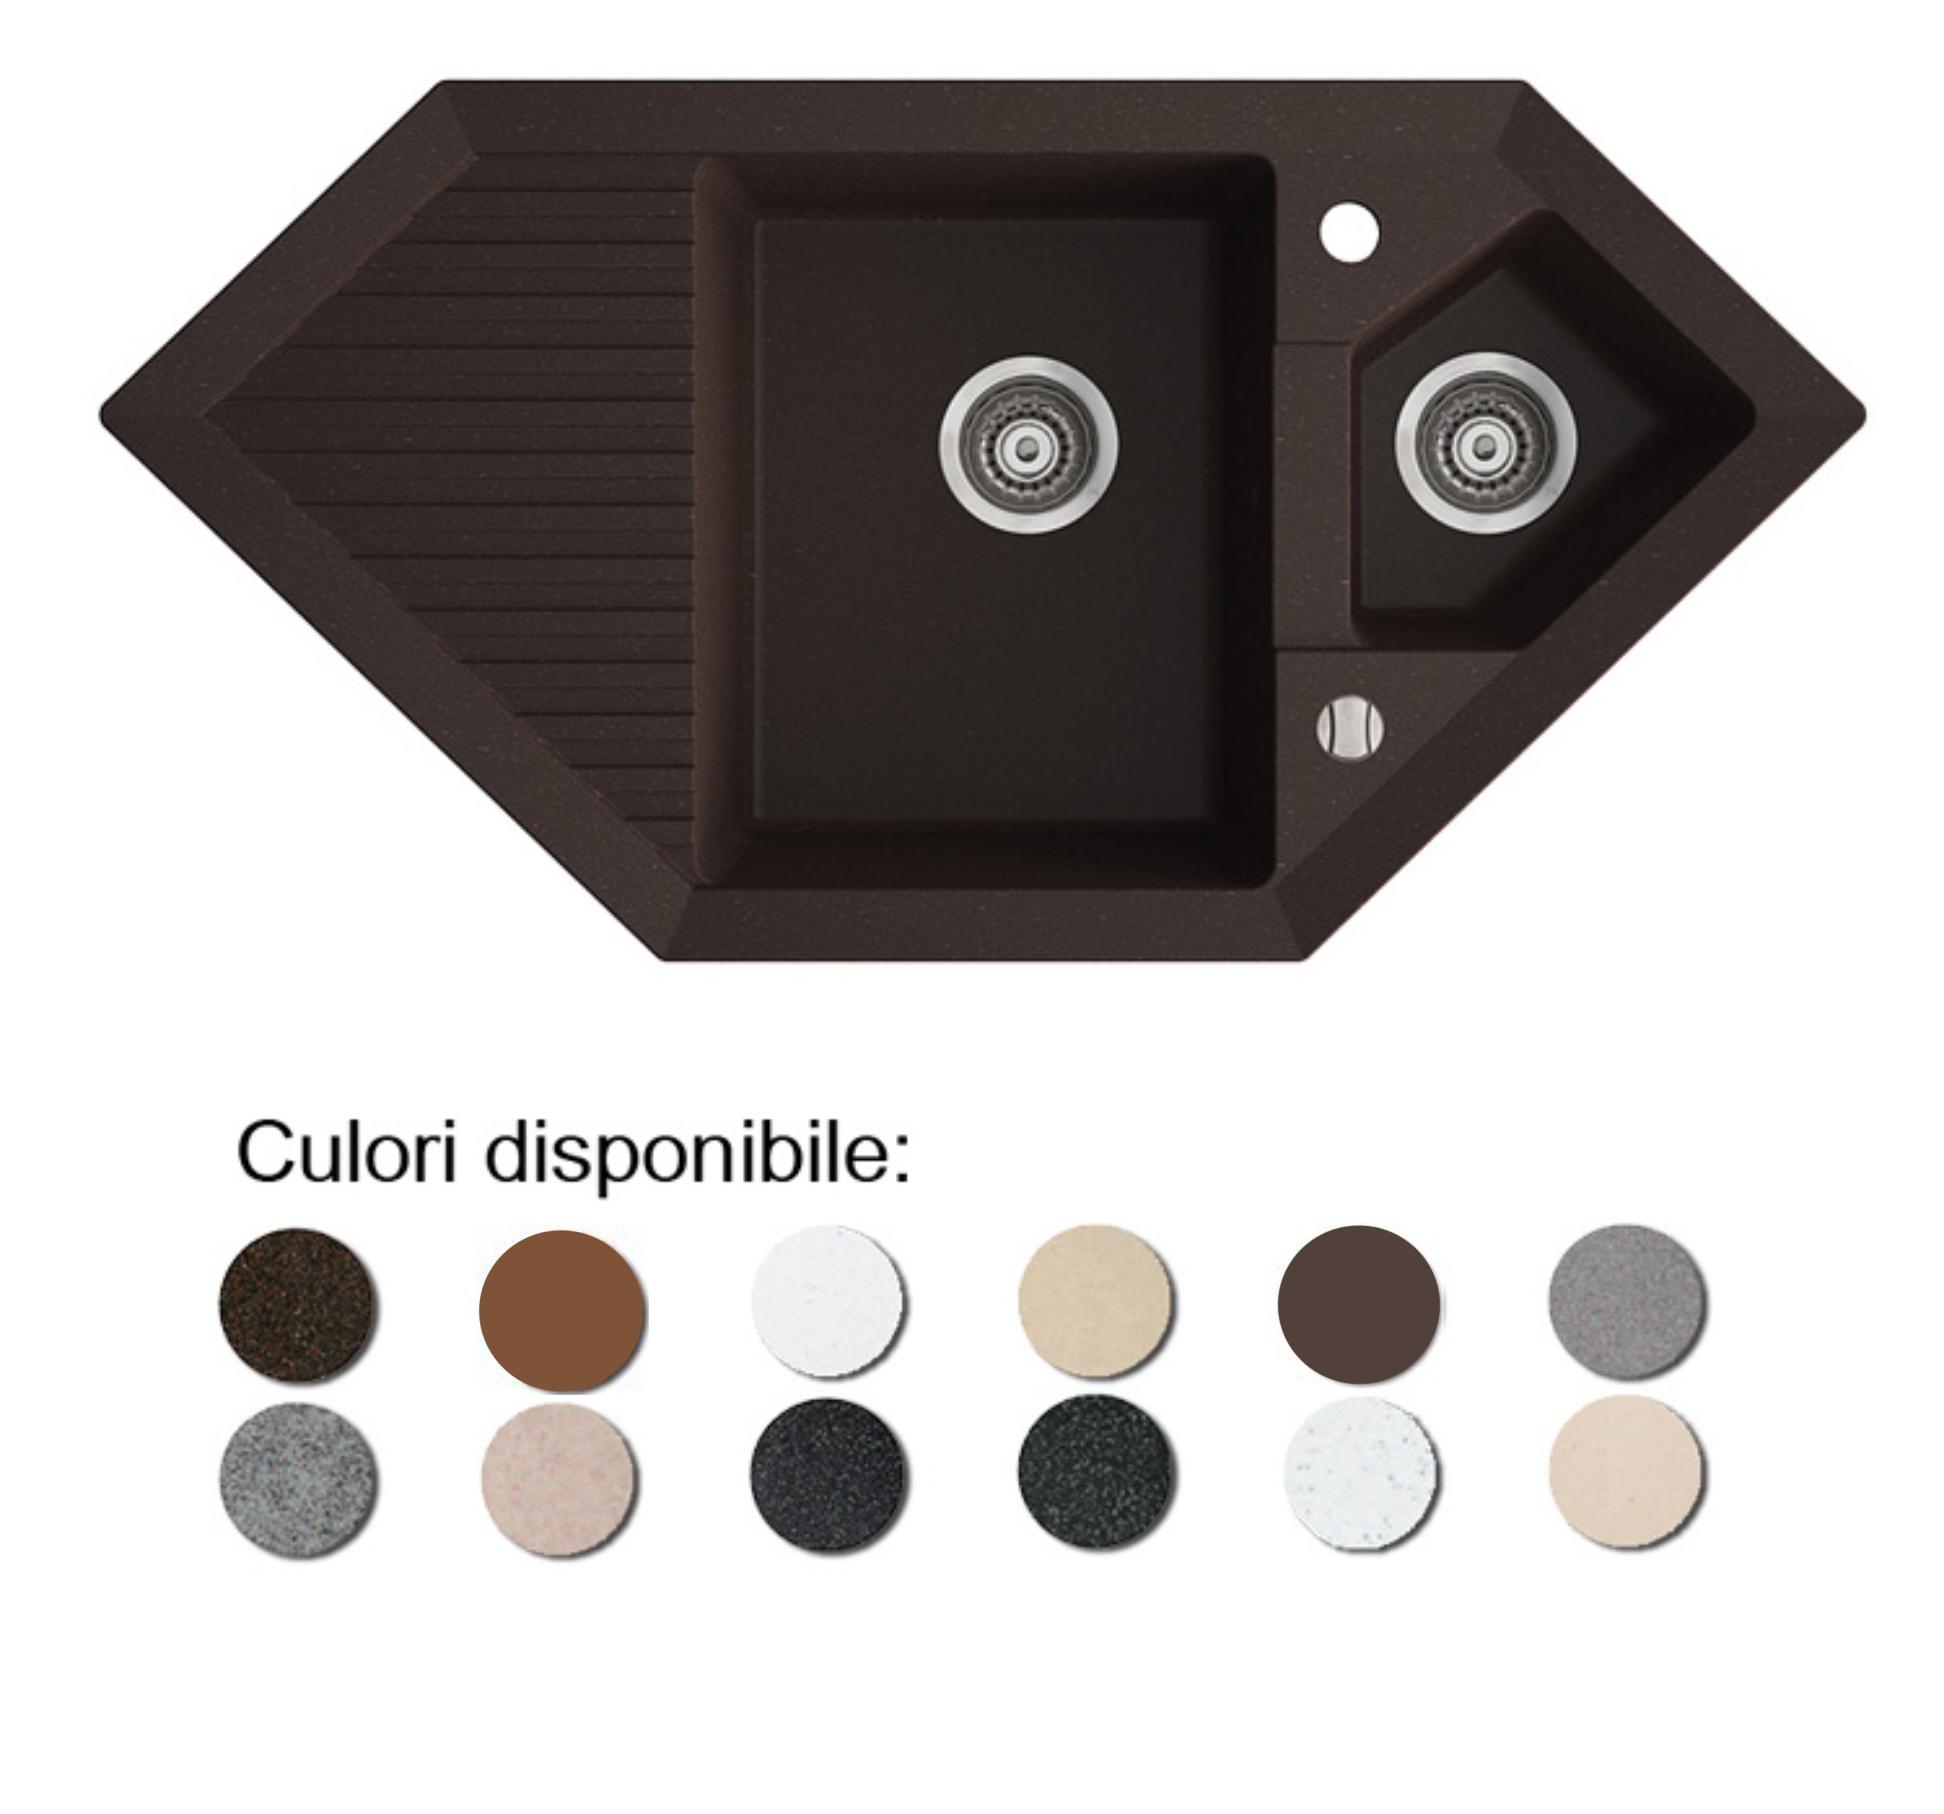 Chiuveta Bucatarie Granit Compozit Anticalcar Trapezoidala Cuve Picurator Chiuvete Ilustratie